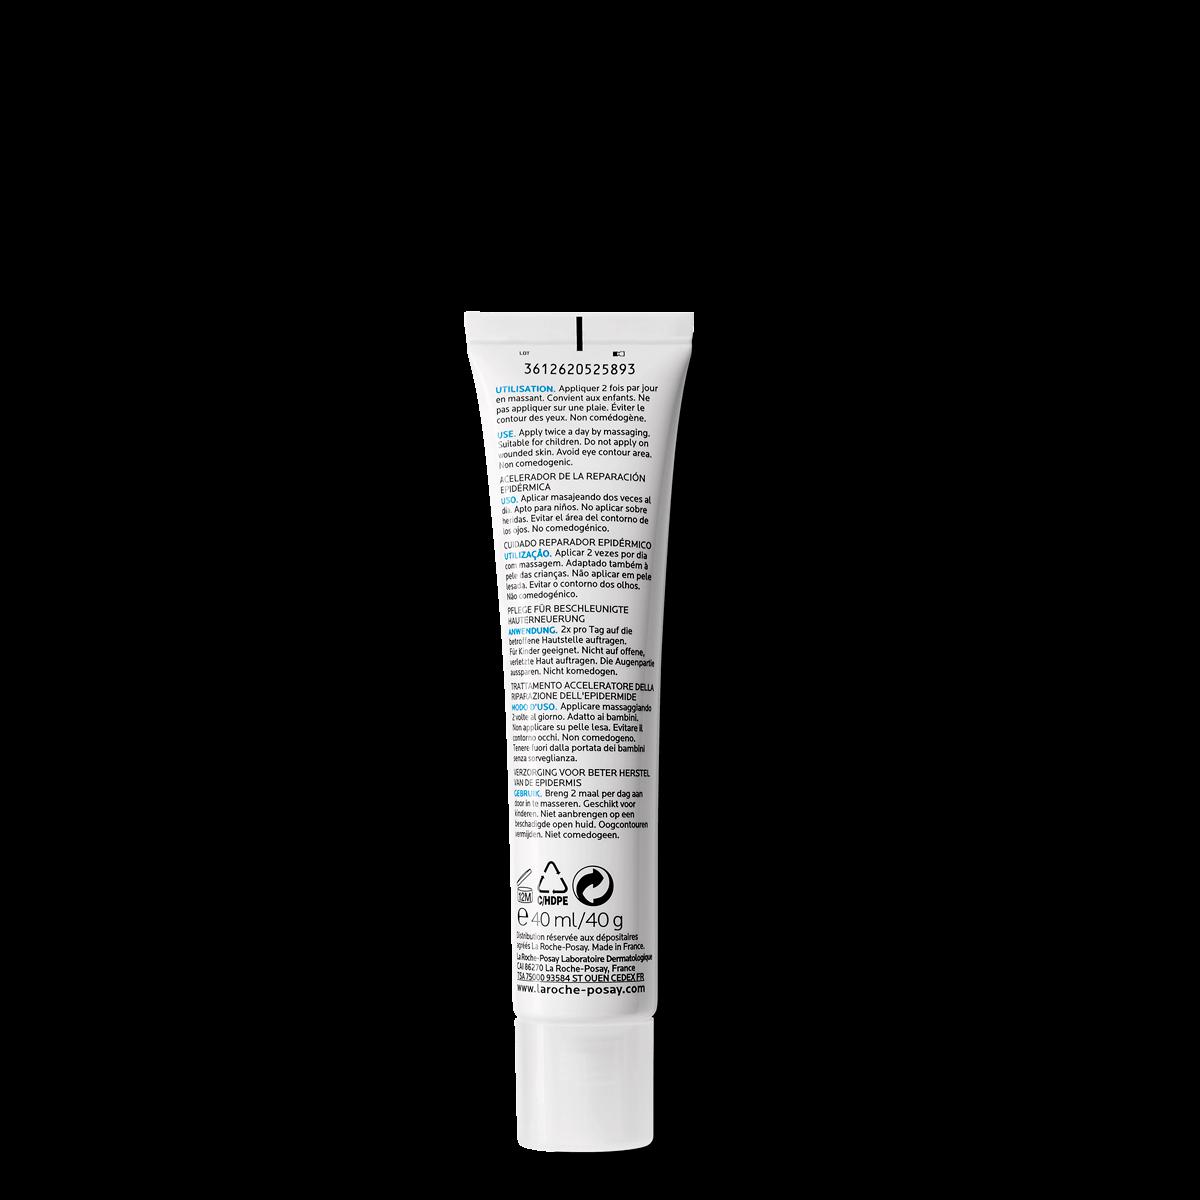 La Roche Posay ProduktSide Skadet Cicaplast Gel B5 Pro Recovery 40ml